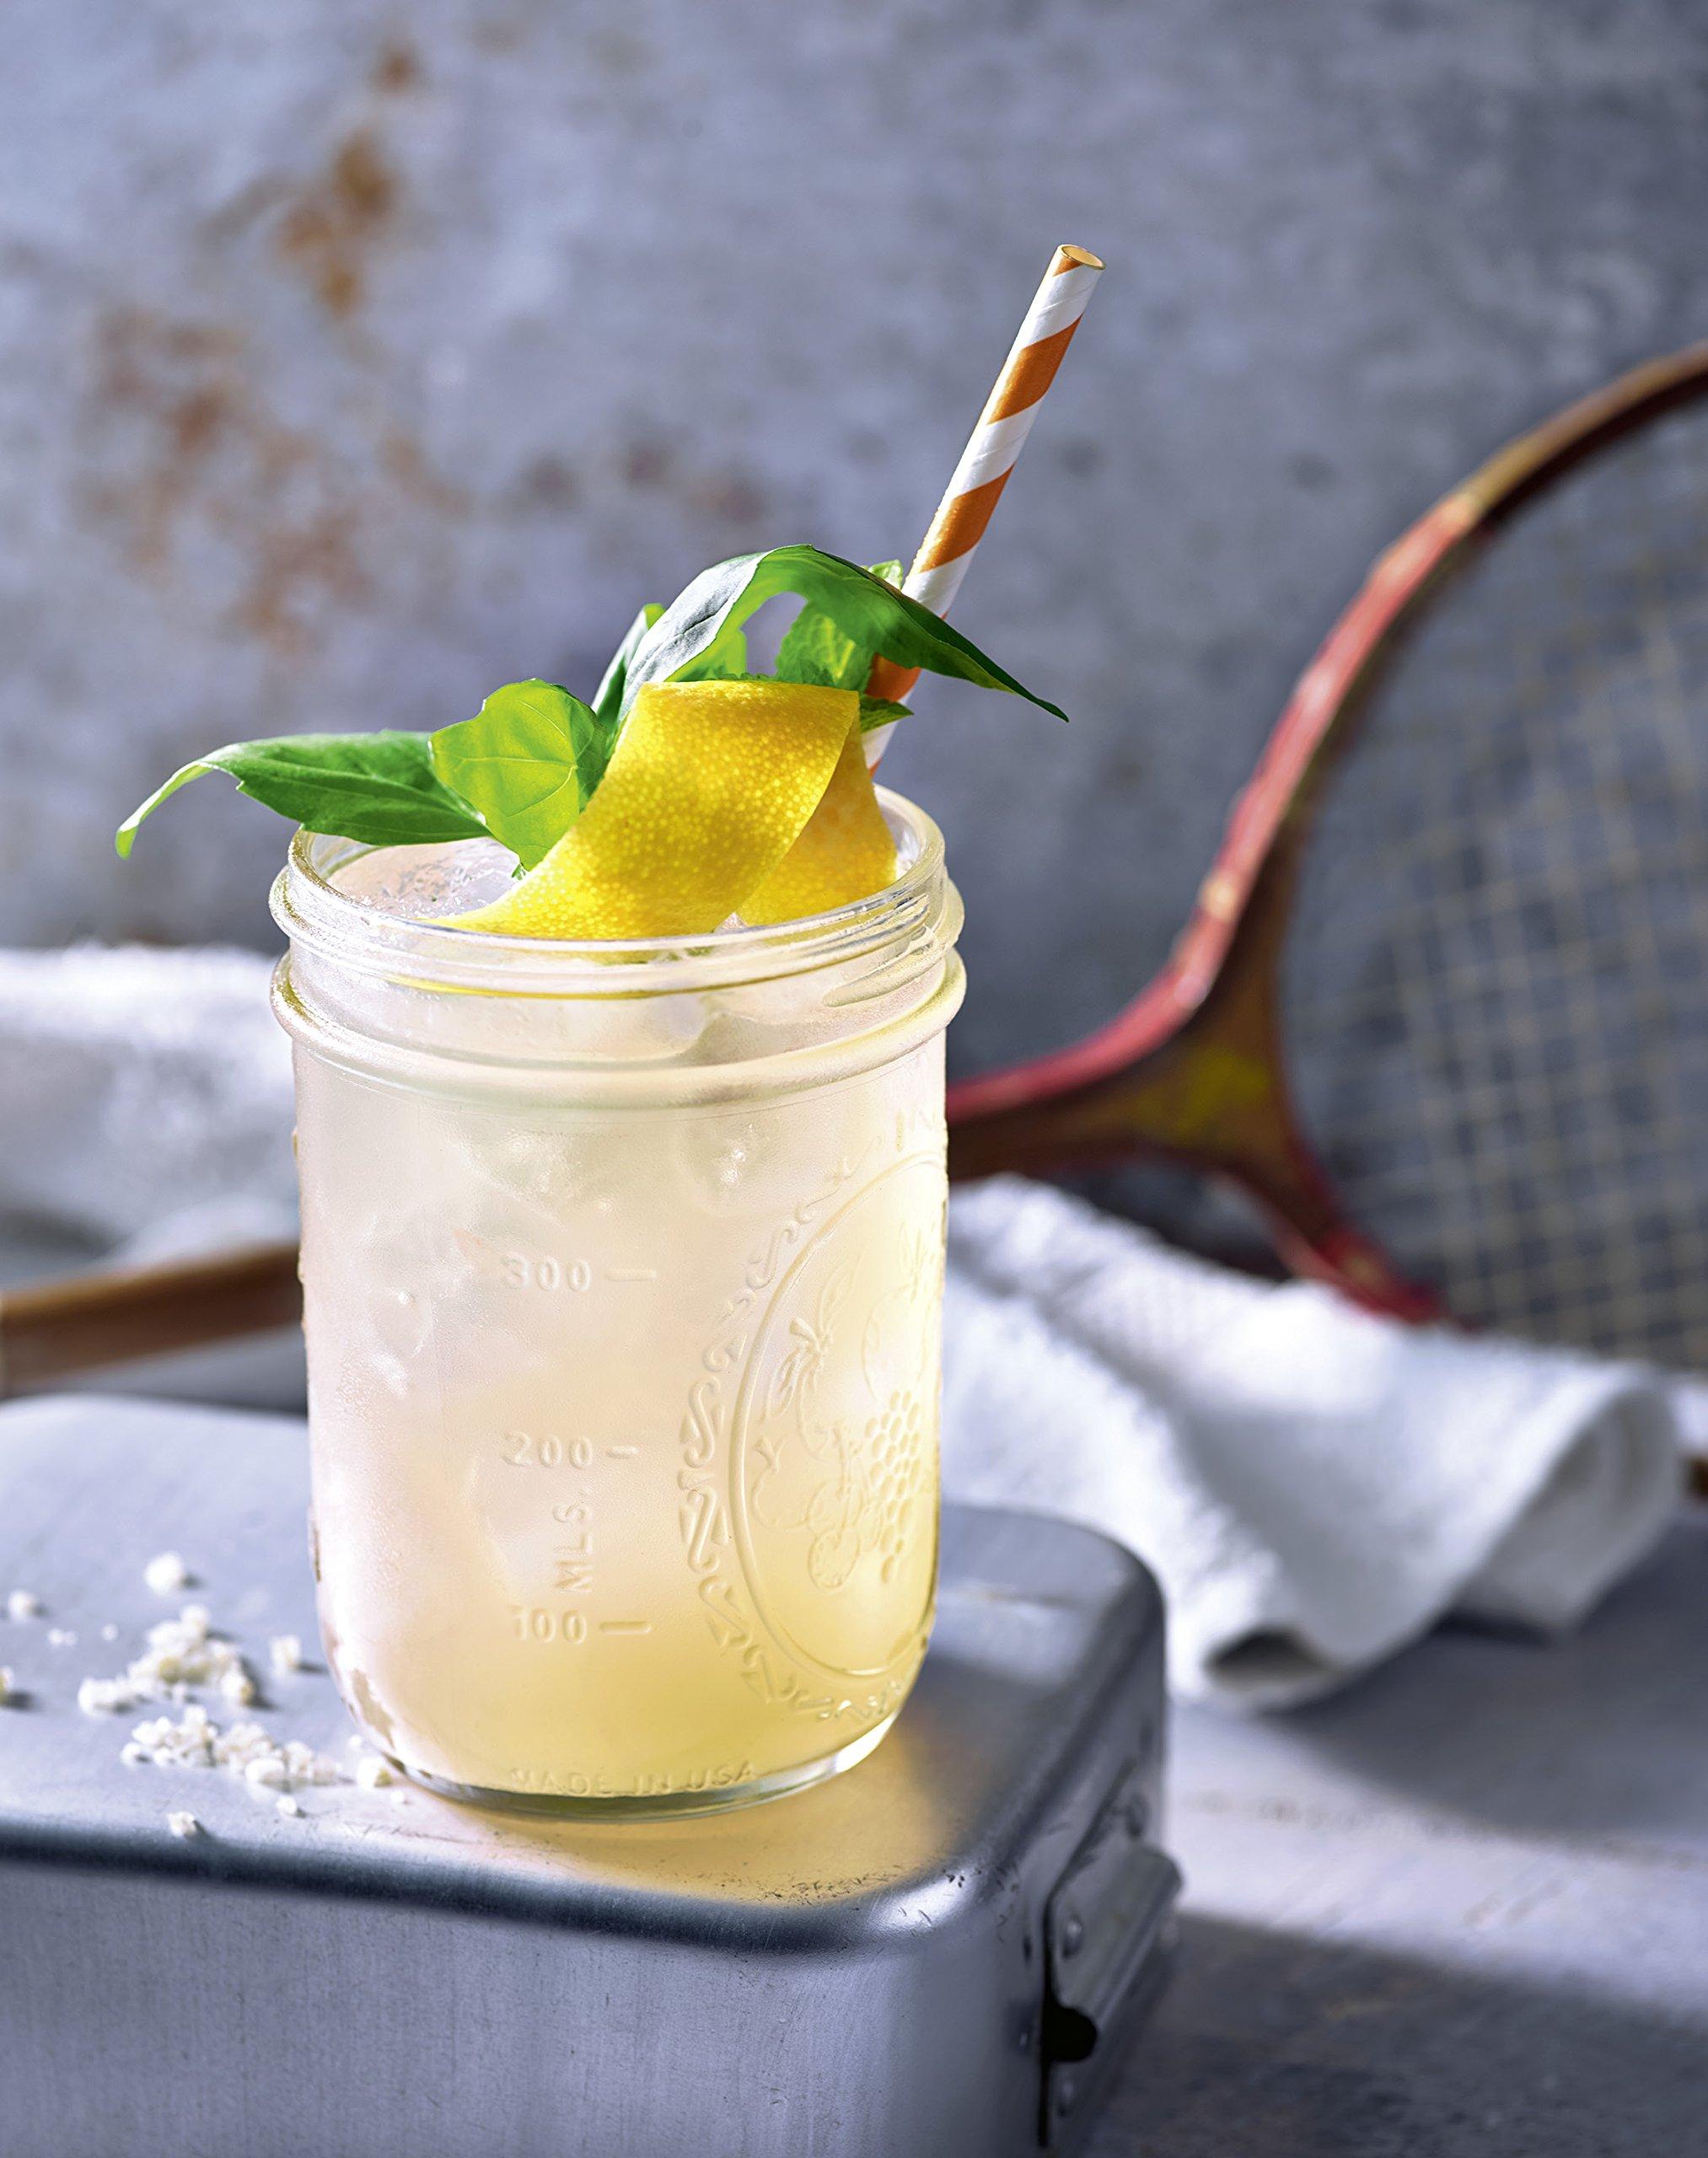 Malerisch Longdrinks Klassiker Galerie Von Shake It Easy: Perfekte Drinks - Klassisch